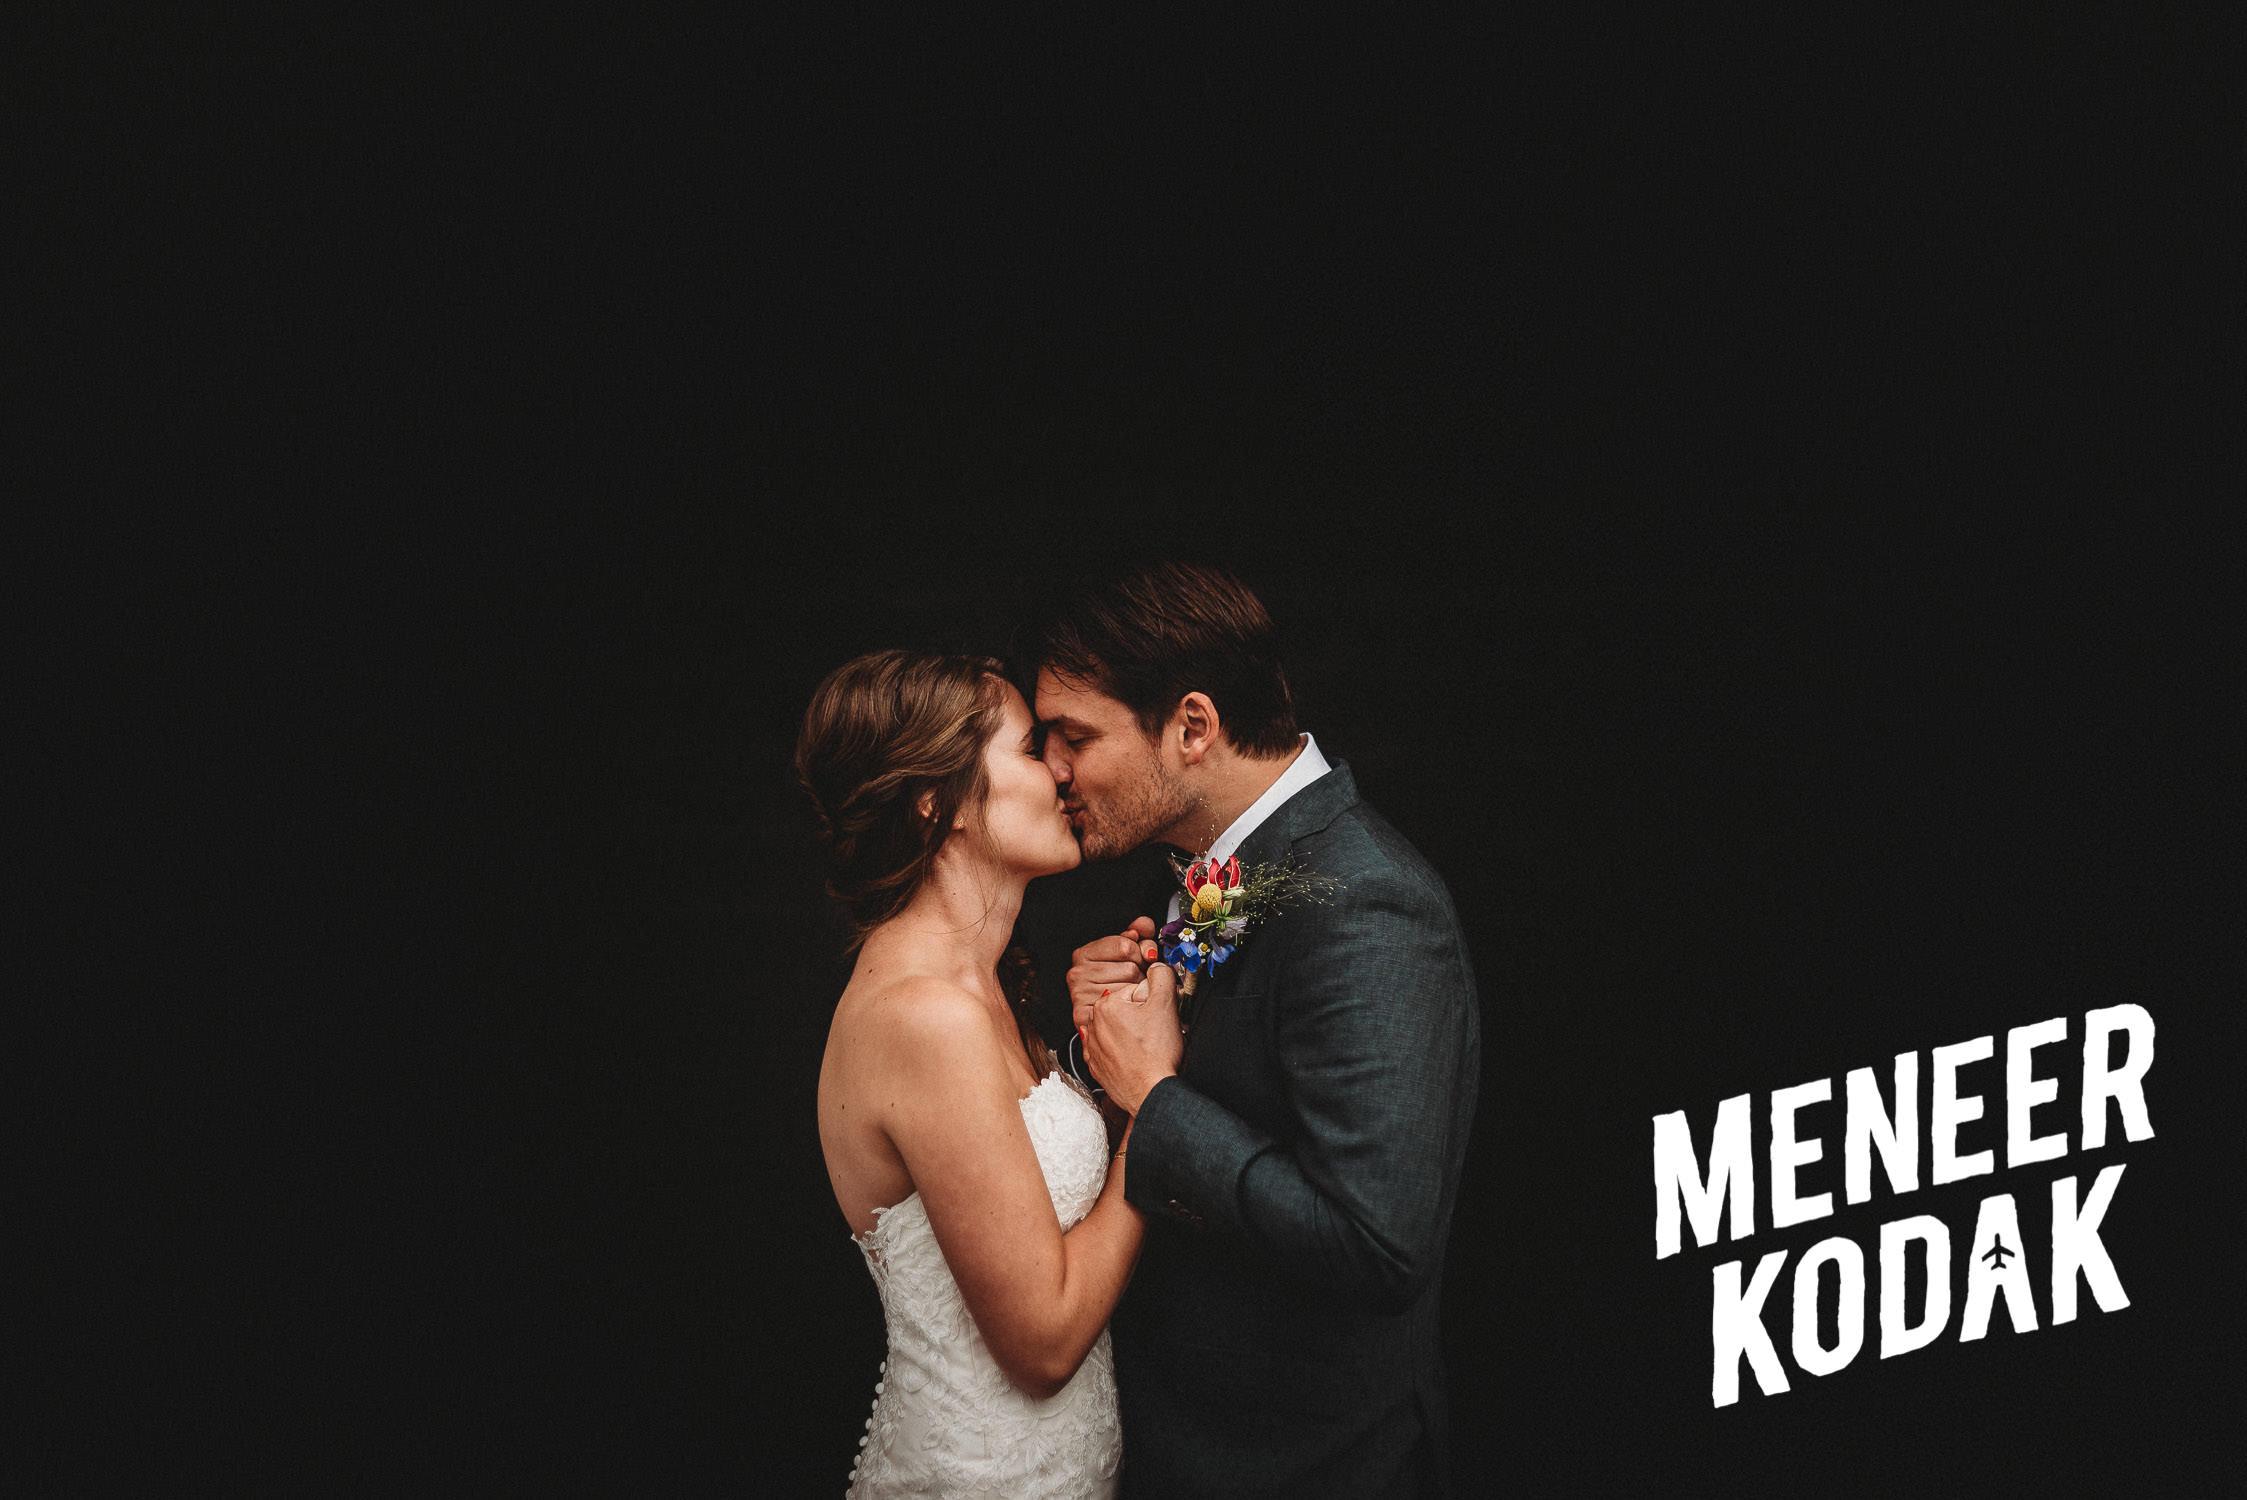 Meneer Kodak - Trouwreportage - Breda - E&M-082.jpg